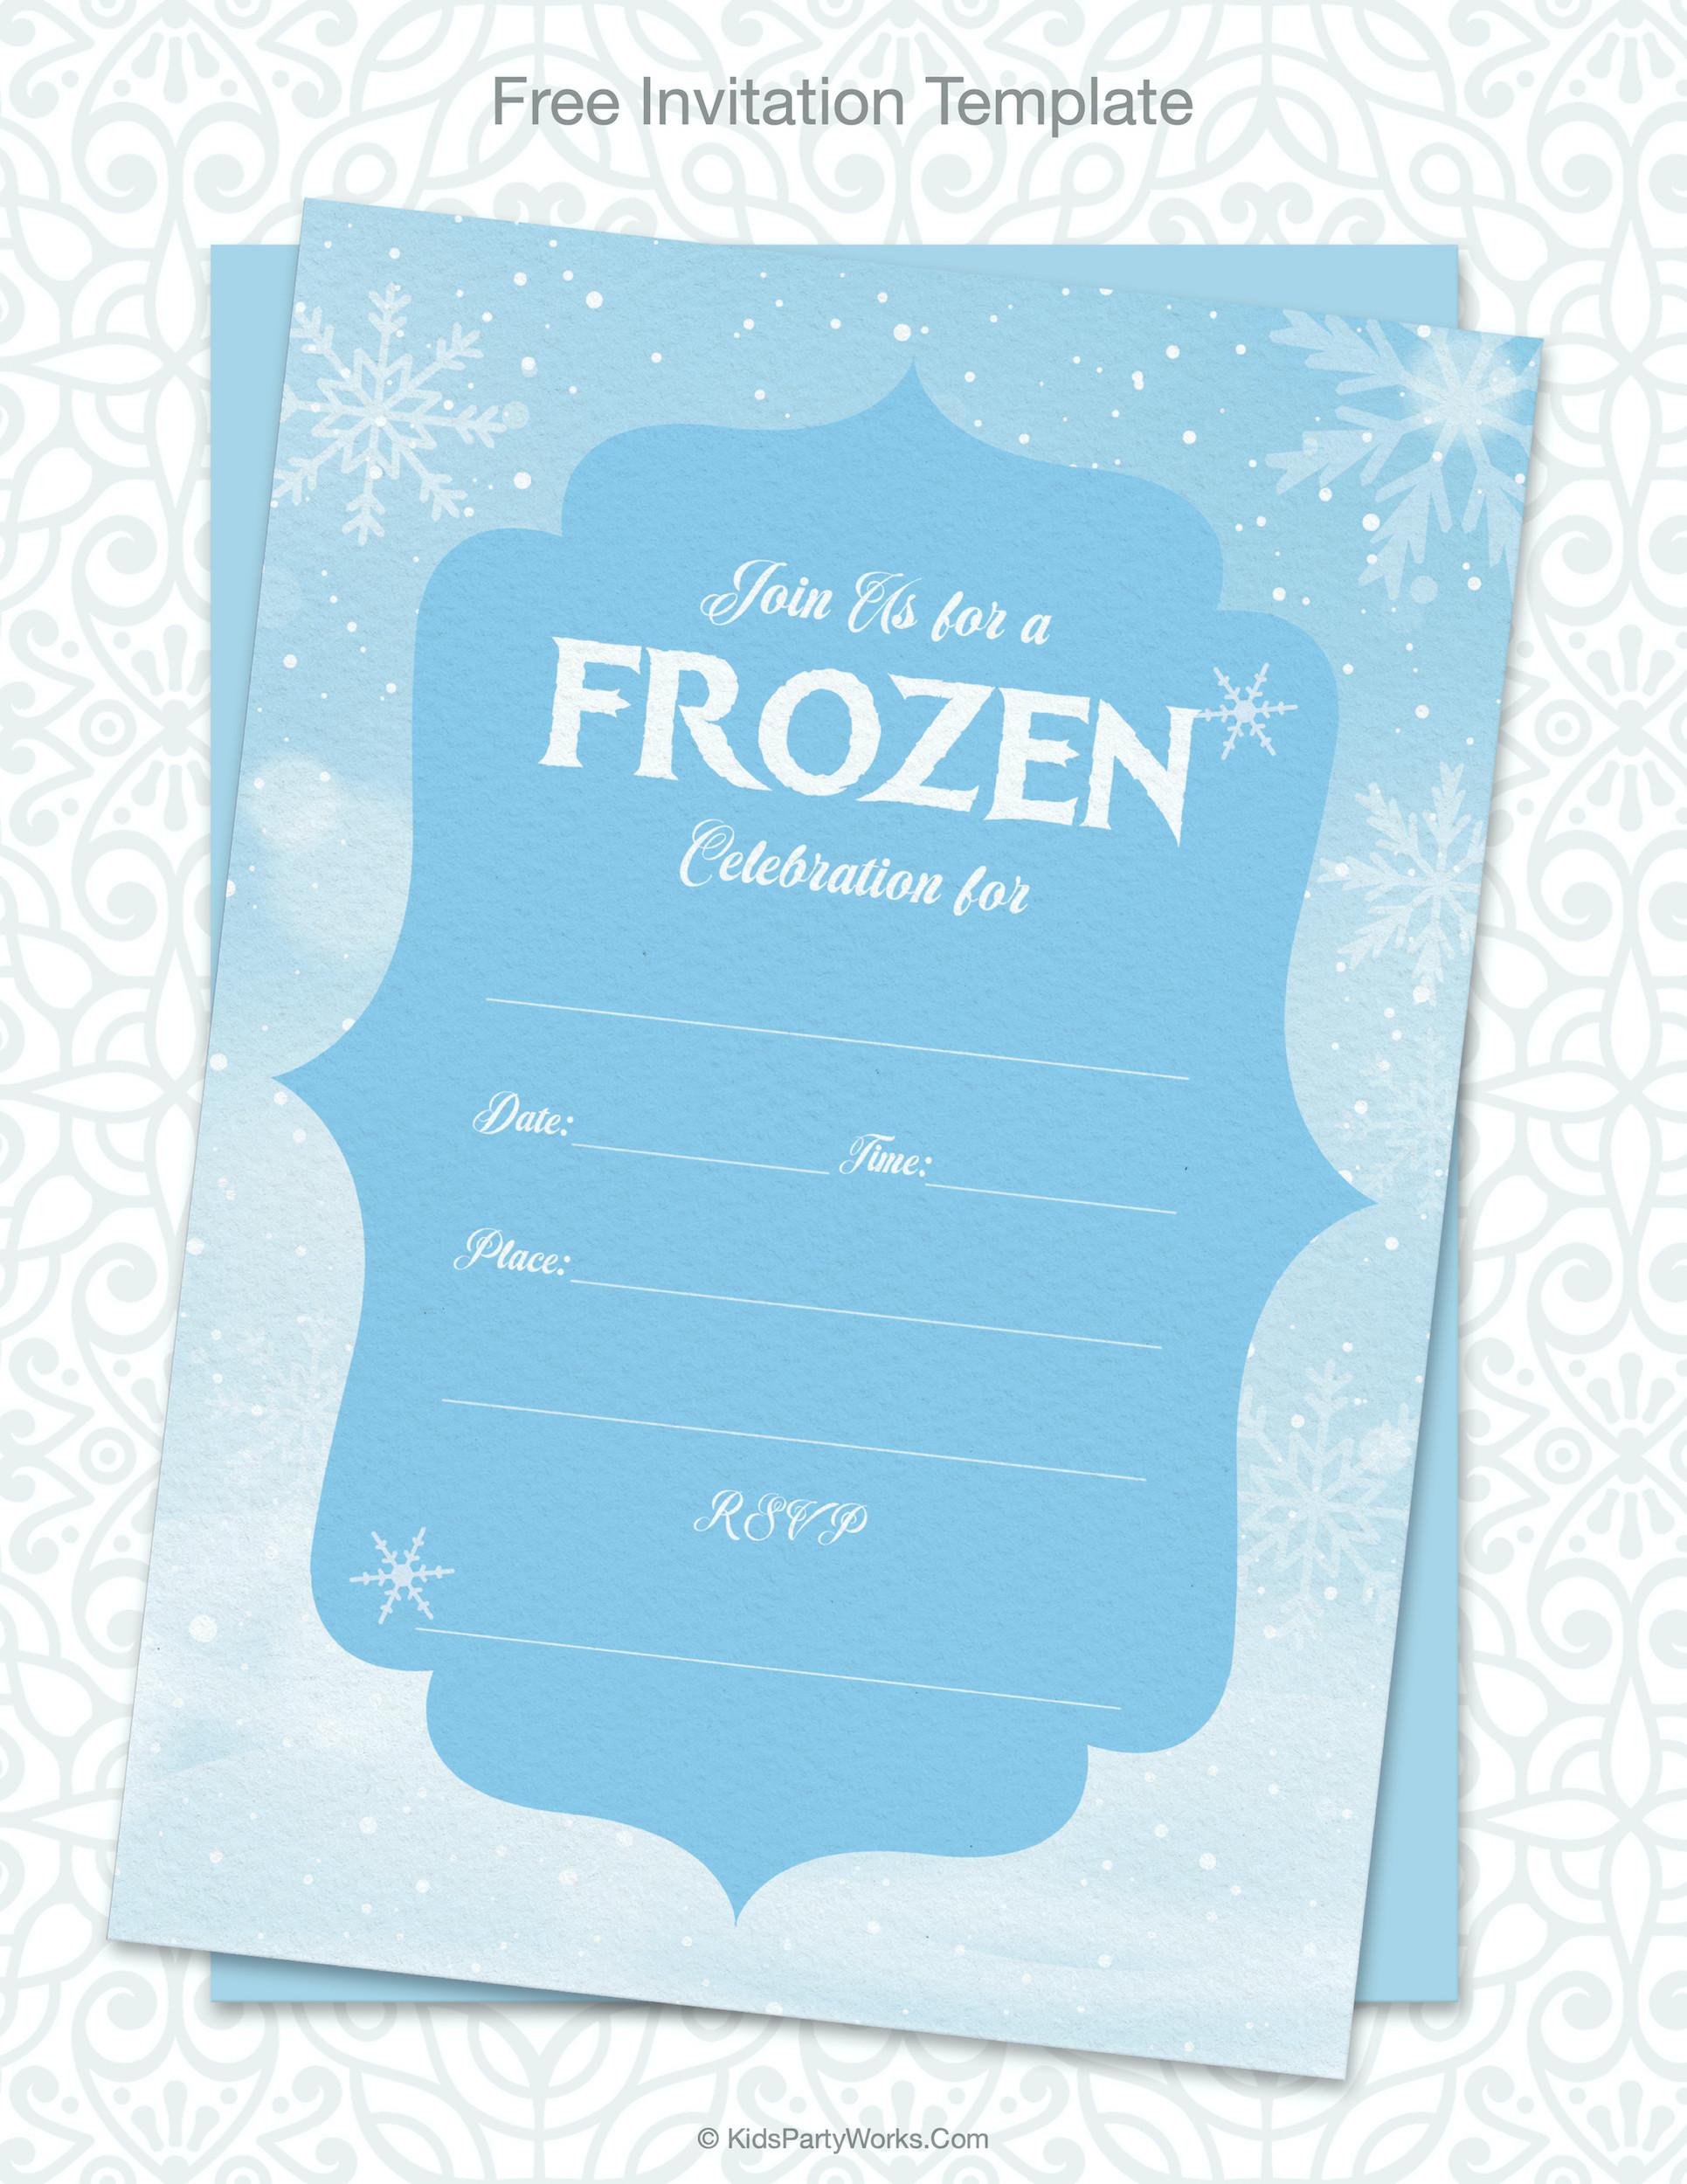 Free Frozen Invitations Printable Frozen Party